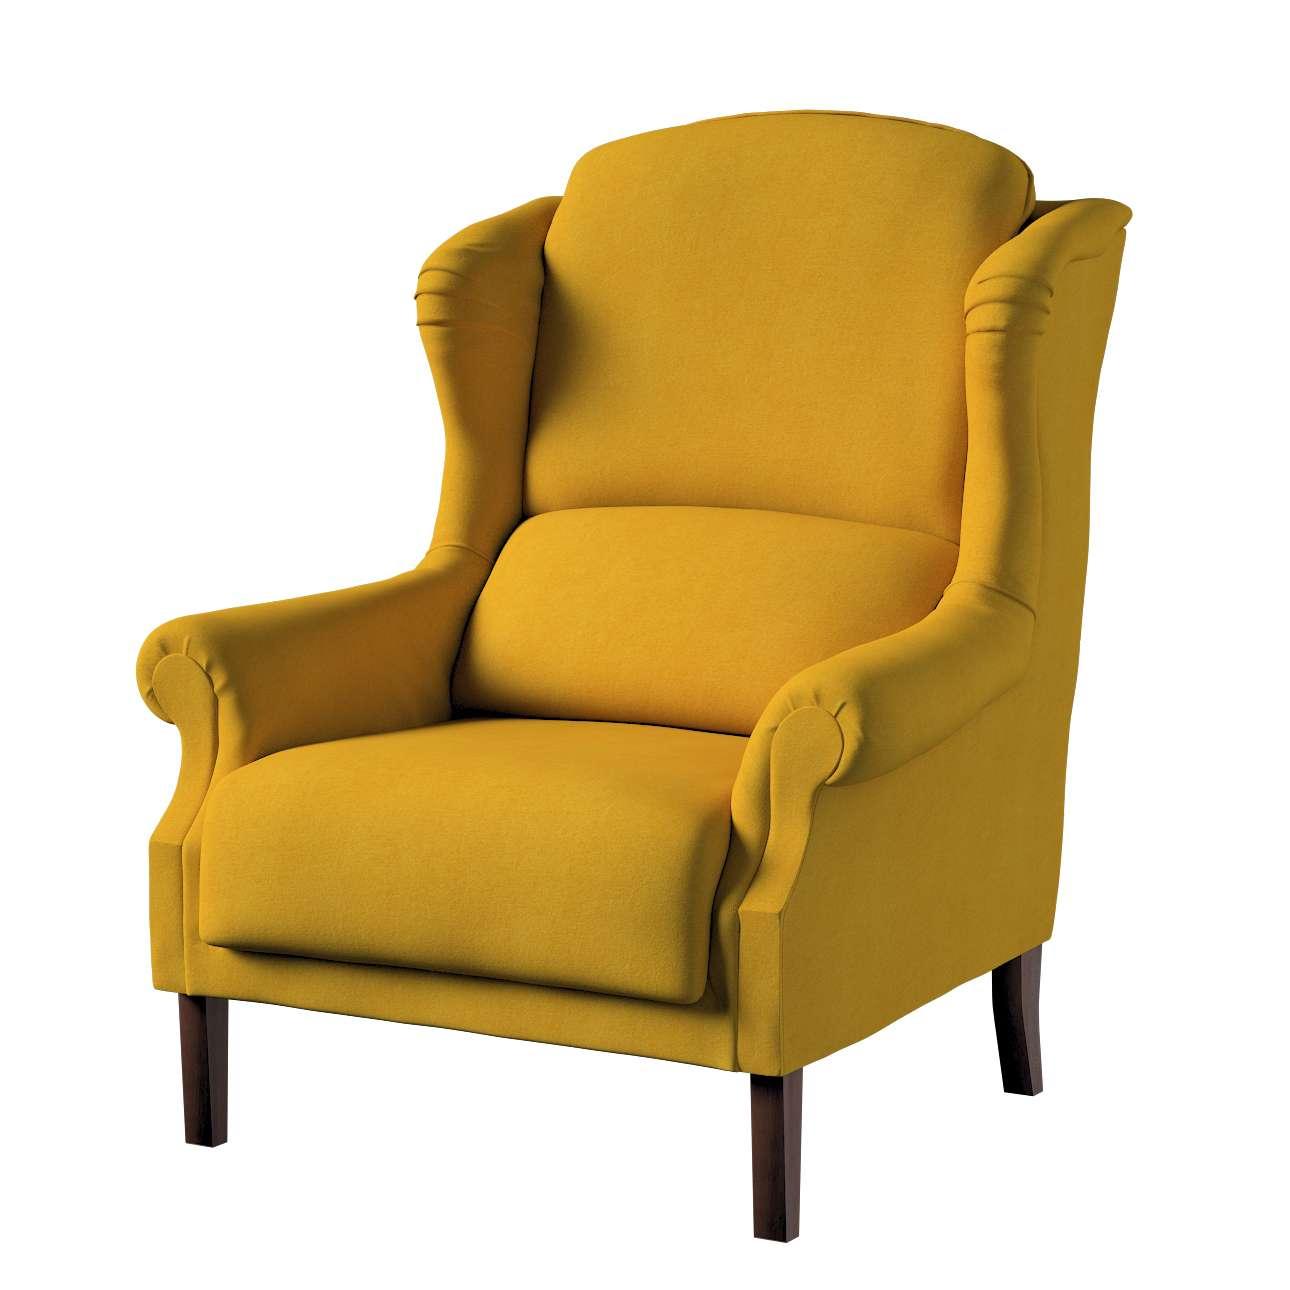 Fotel Unique w kolekcji Etna , tkanina: 705-04